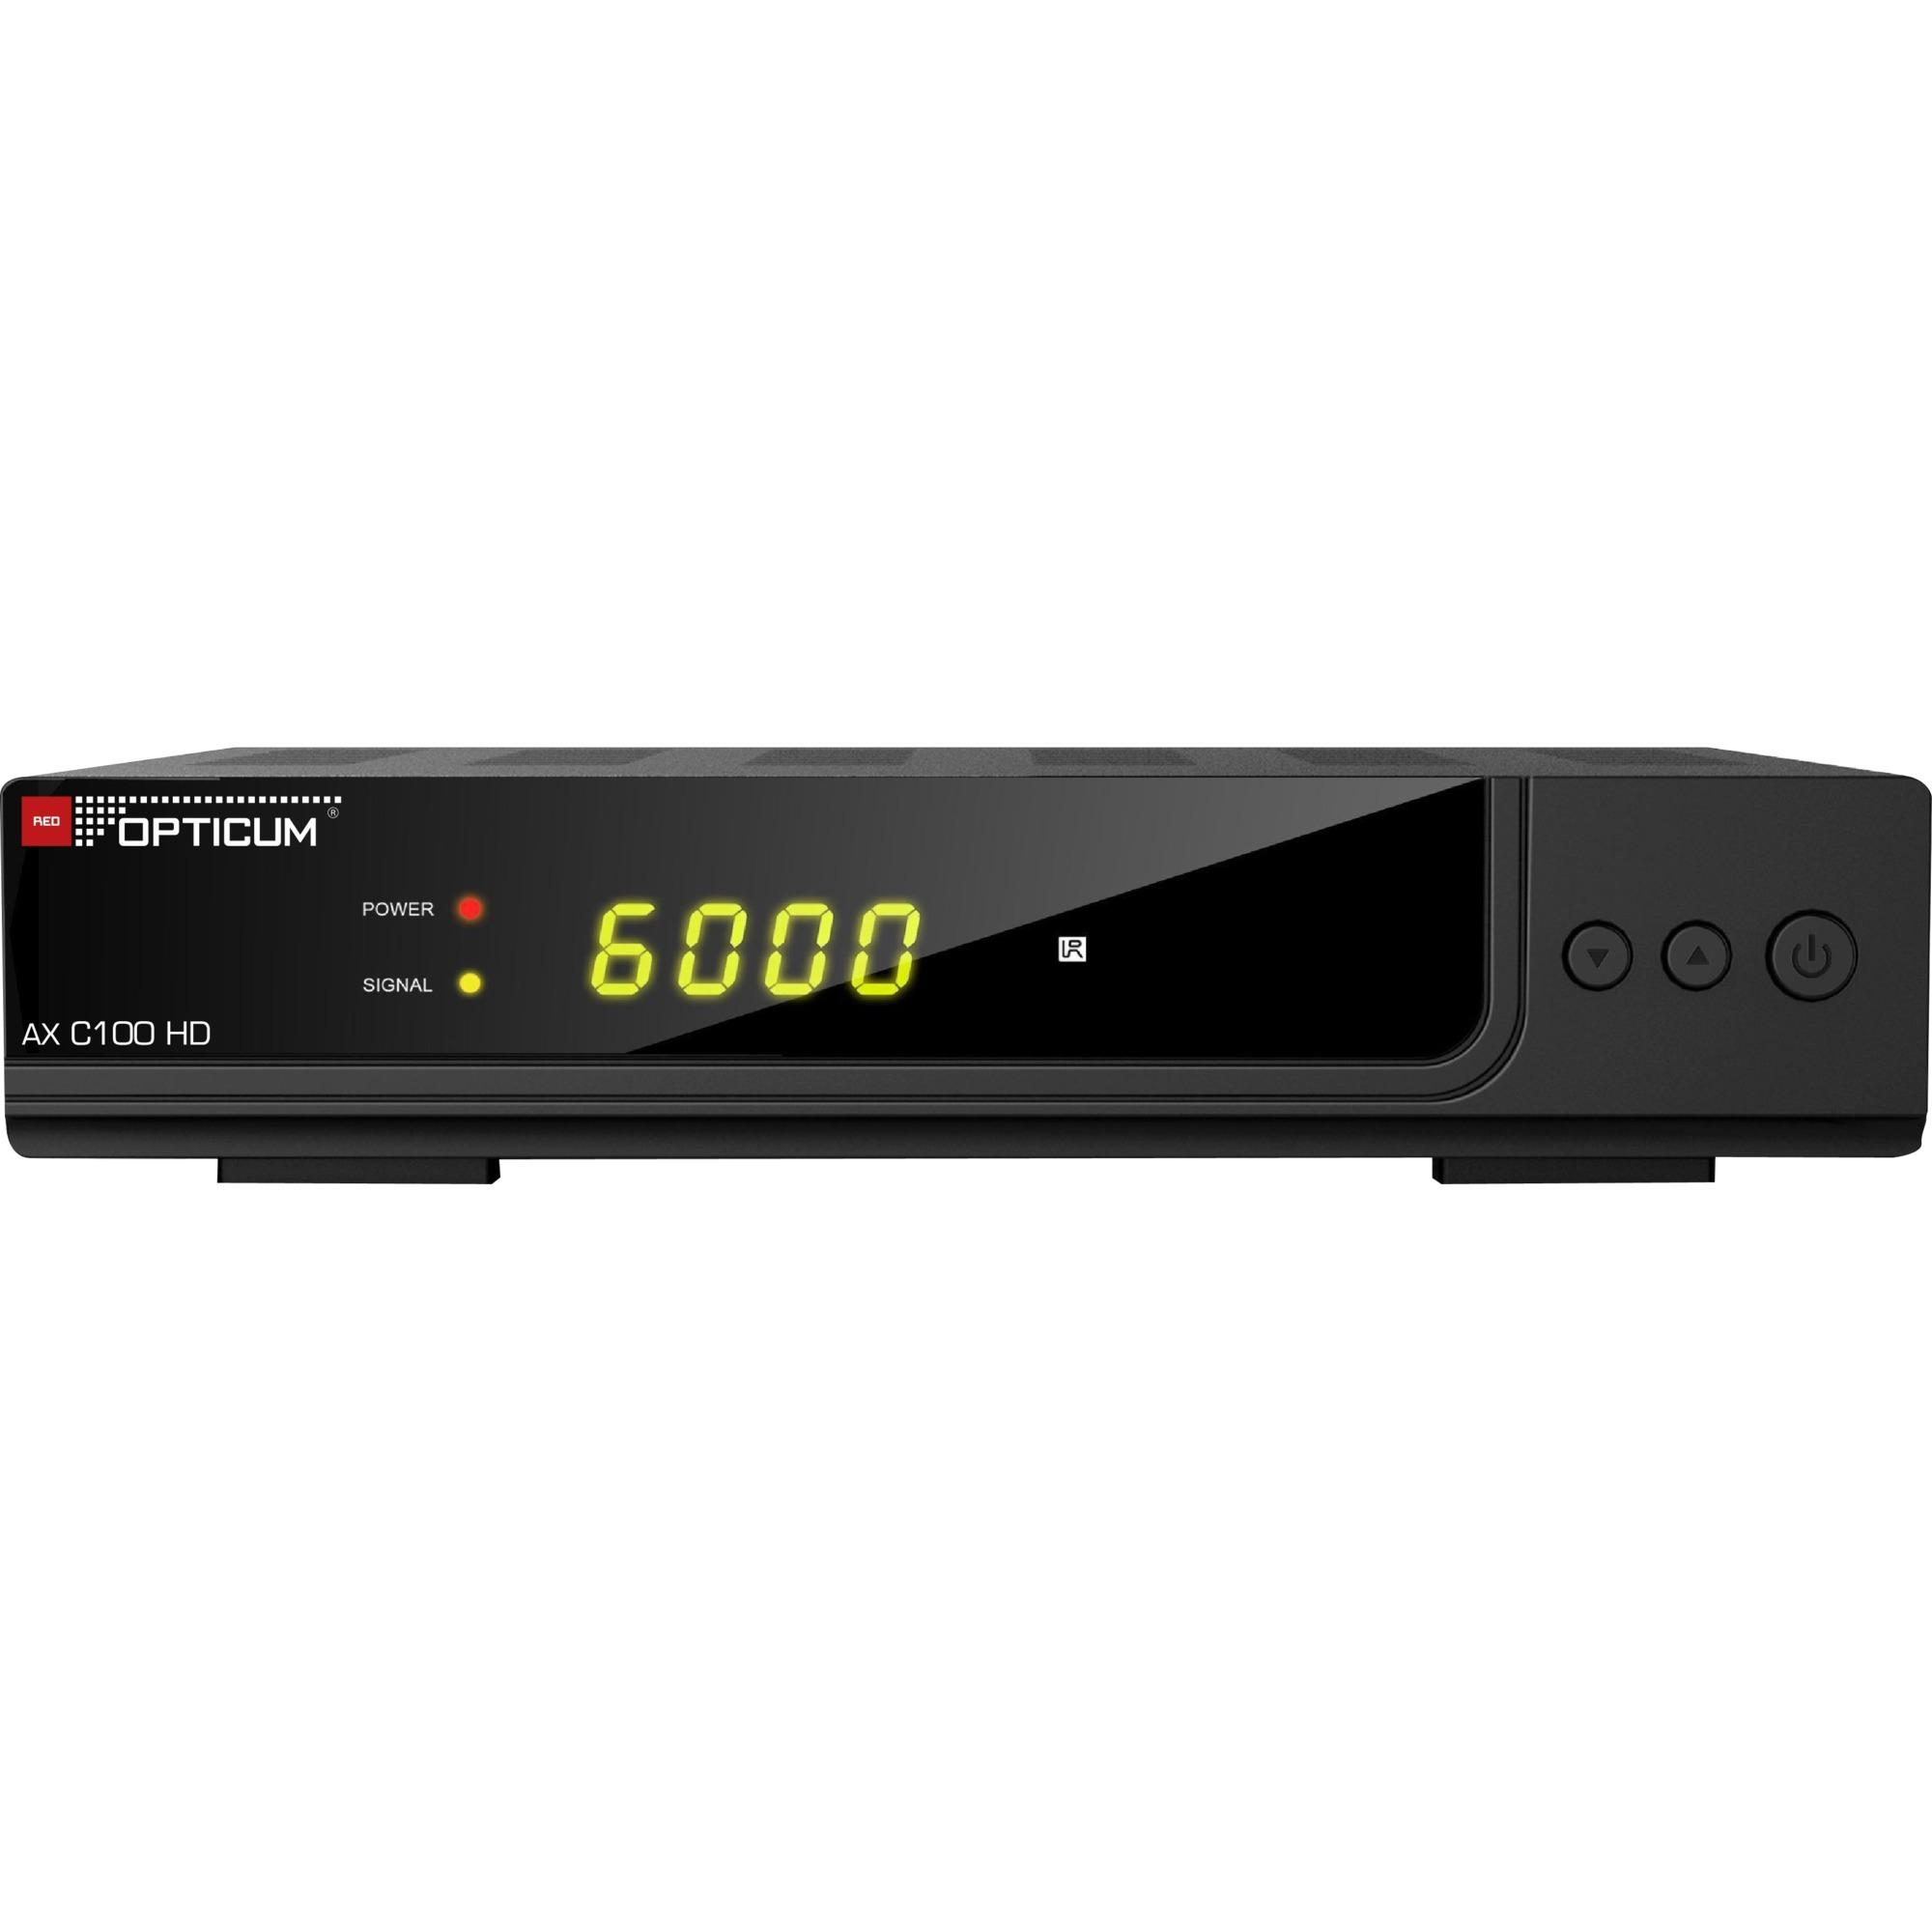 AX C100 HD tV set-top boxes Cable Alta Definición Total Negro, Receptor de cable